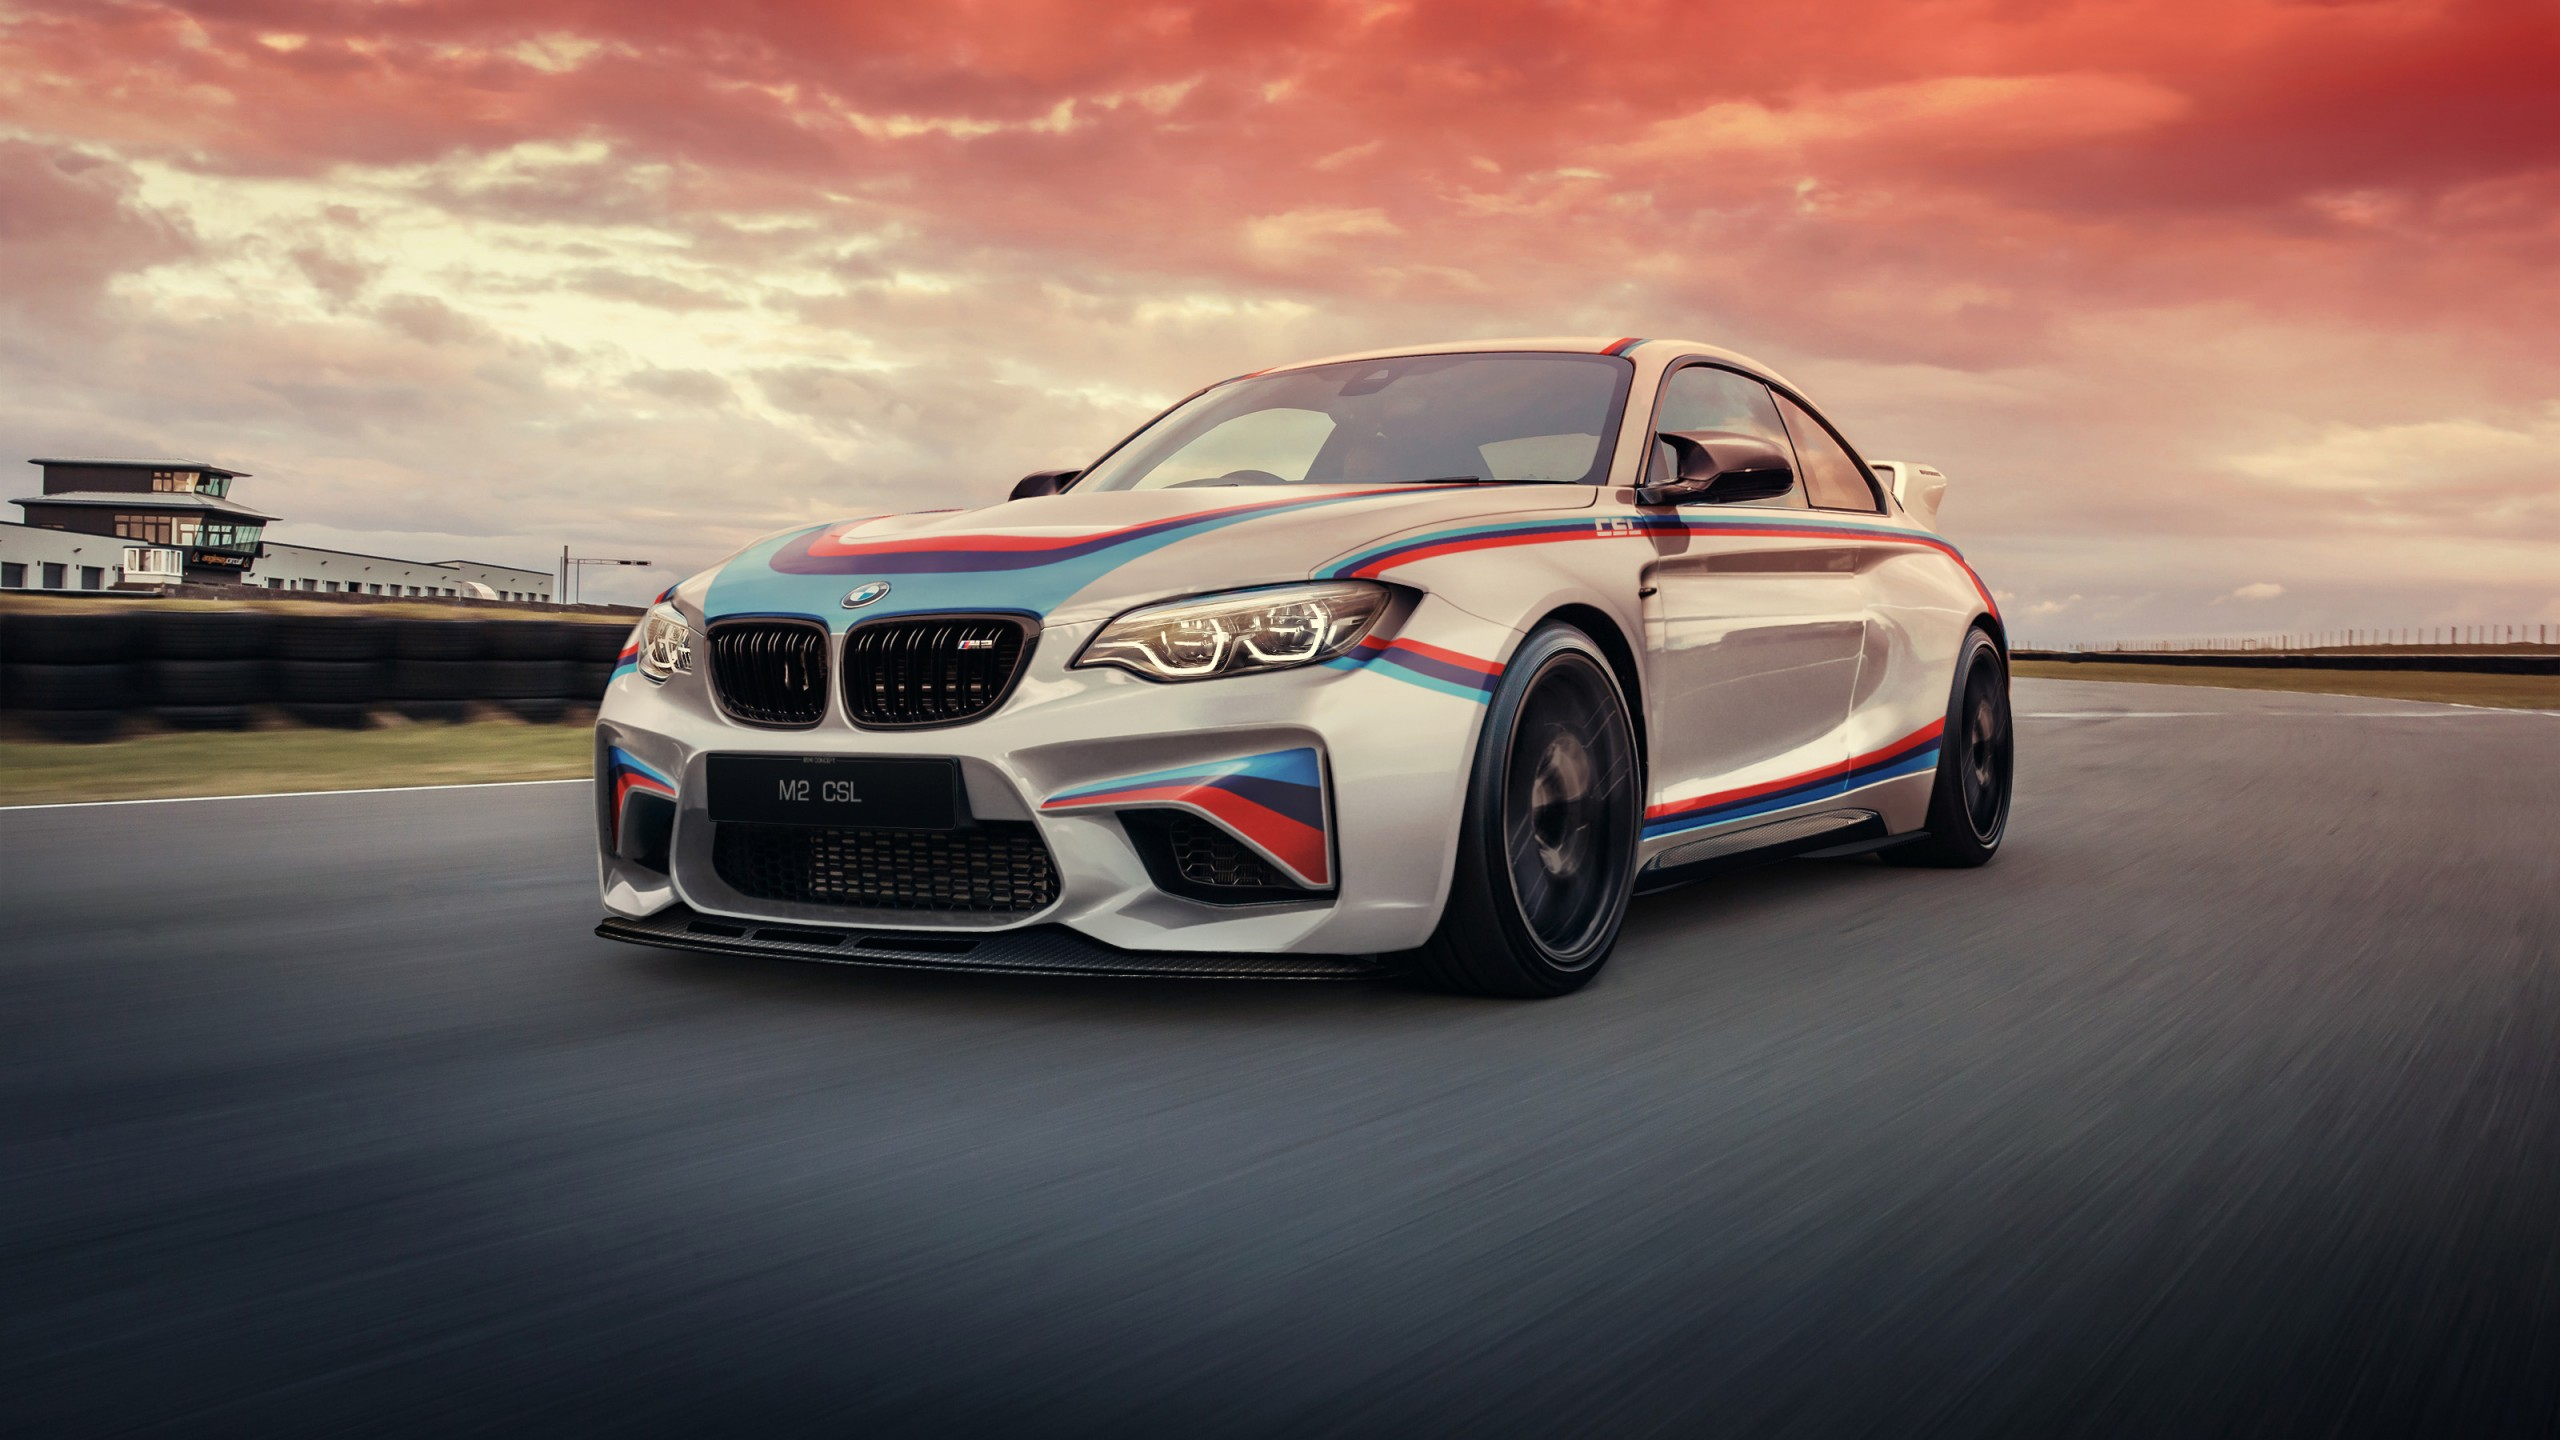 2017 BMW M2 CSL Wallpaper | HD Car Wallpapers | ID #8081